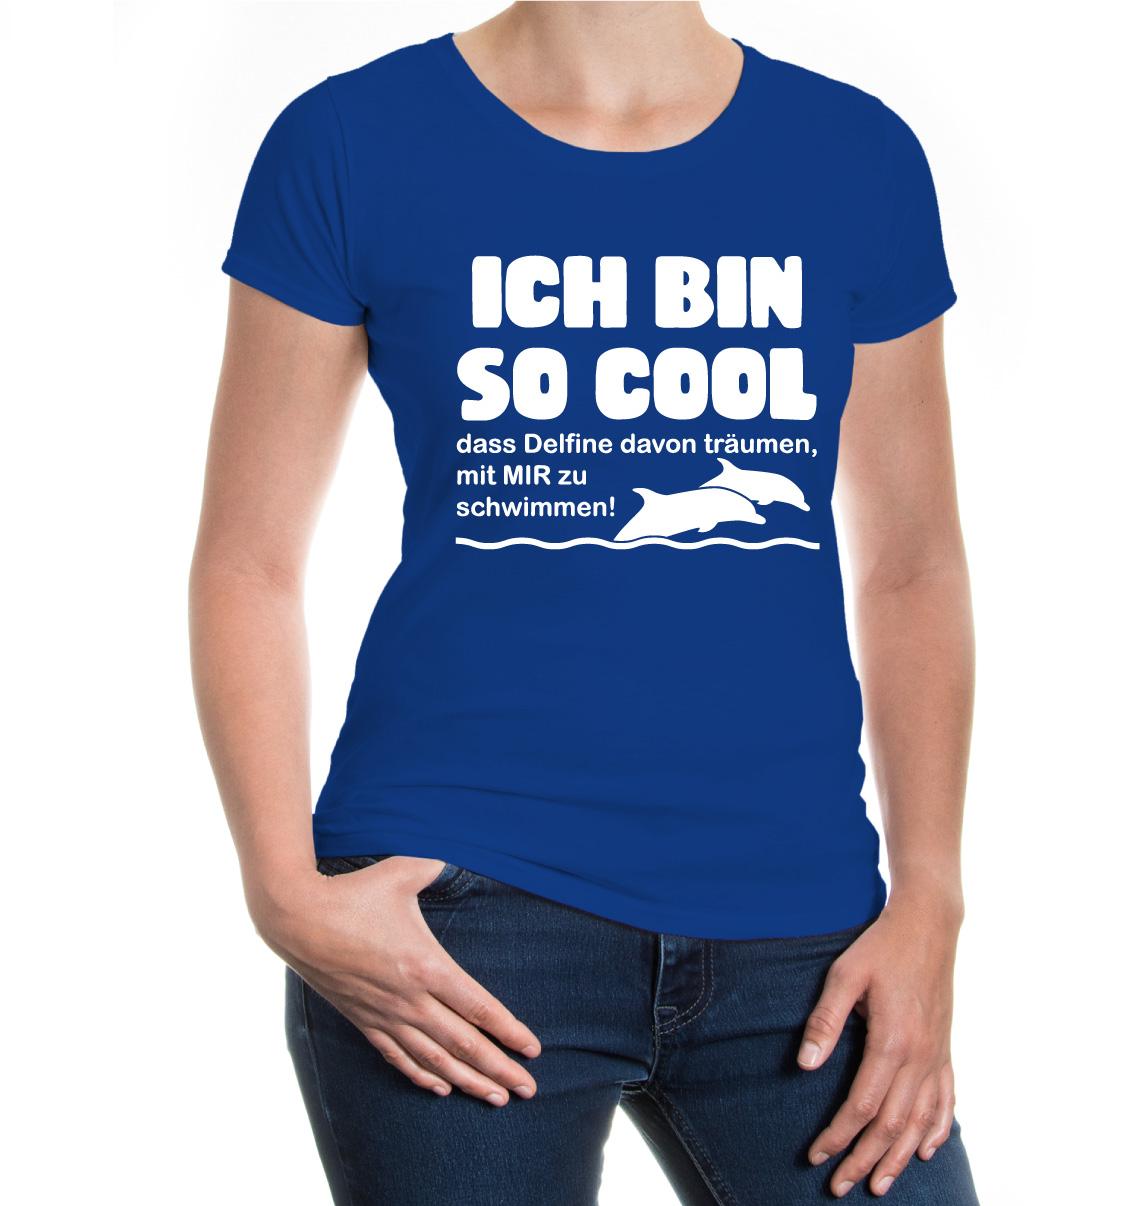 Full Size of Coole T Shirt Sprüche Girlie T Shirt Ich Bin So Cool Junggesellinnenabschied Lustige Wandtattoos Wandtattoo Männer Jutebeutel Wandsprüche Küche Coole T Shirt Sprüche